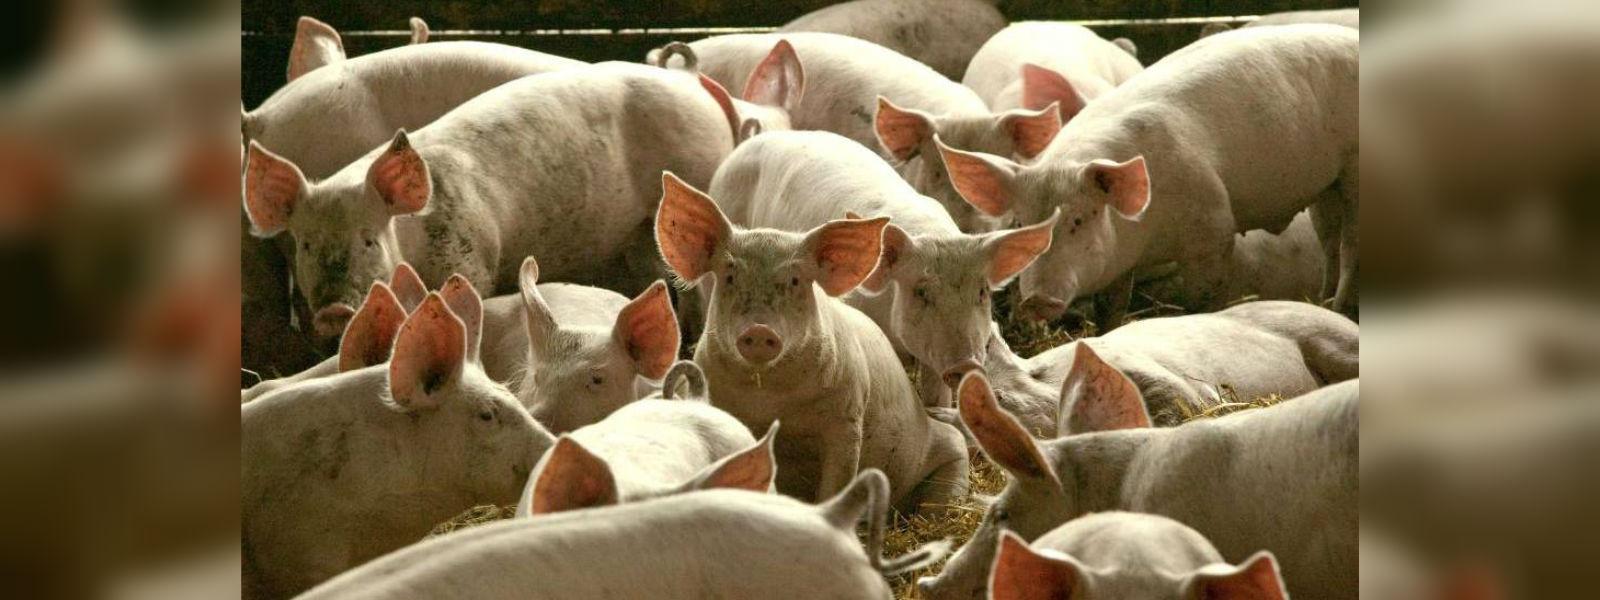 Chinese unfazed by swine fever shops for pork